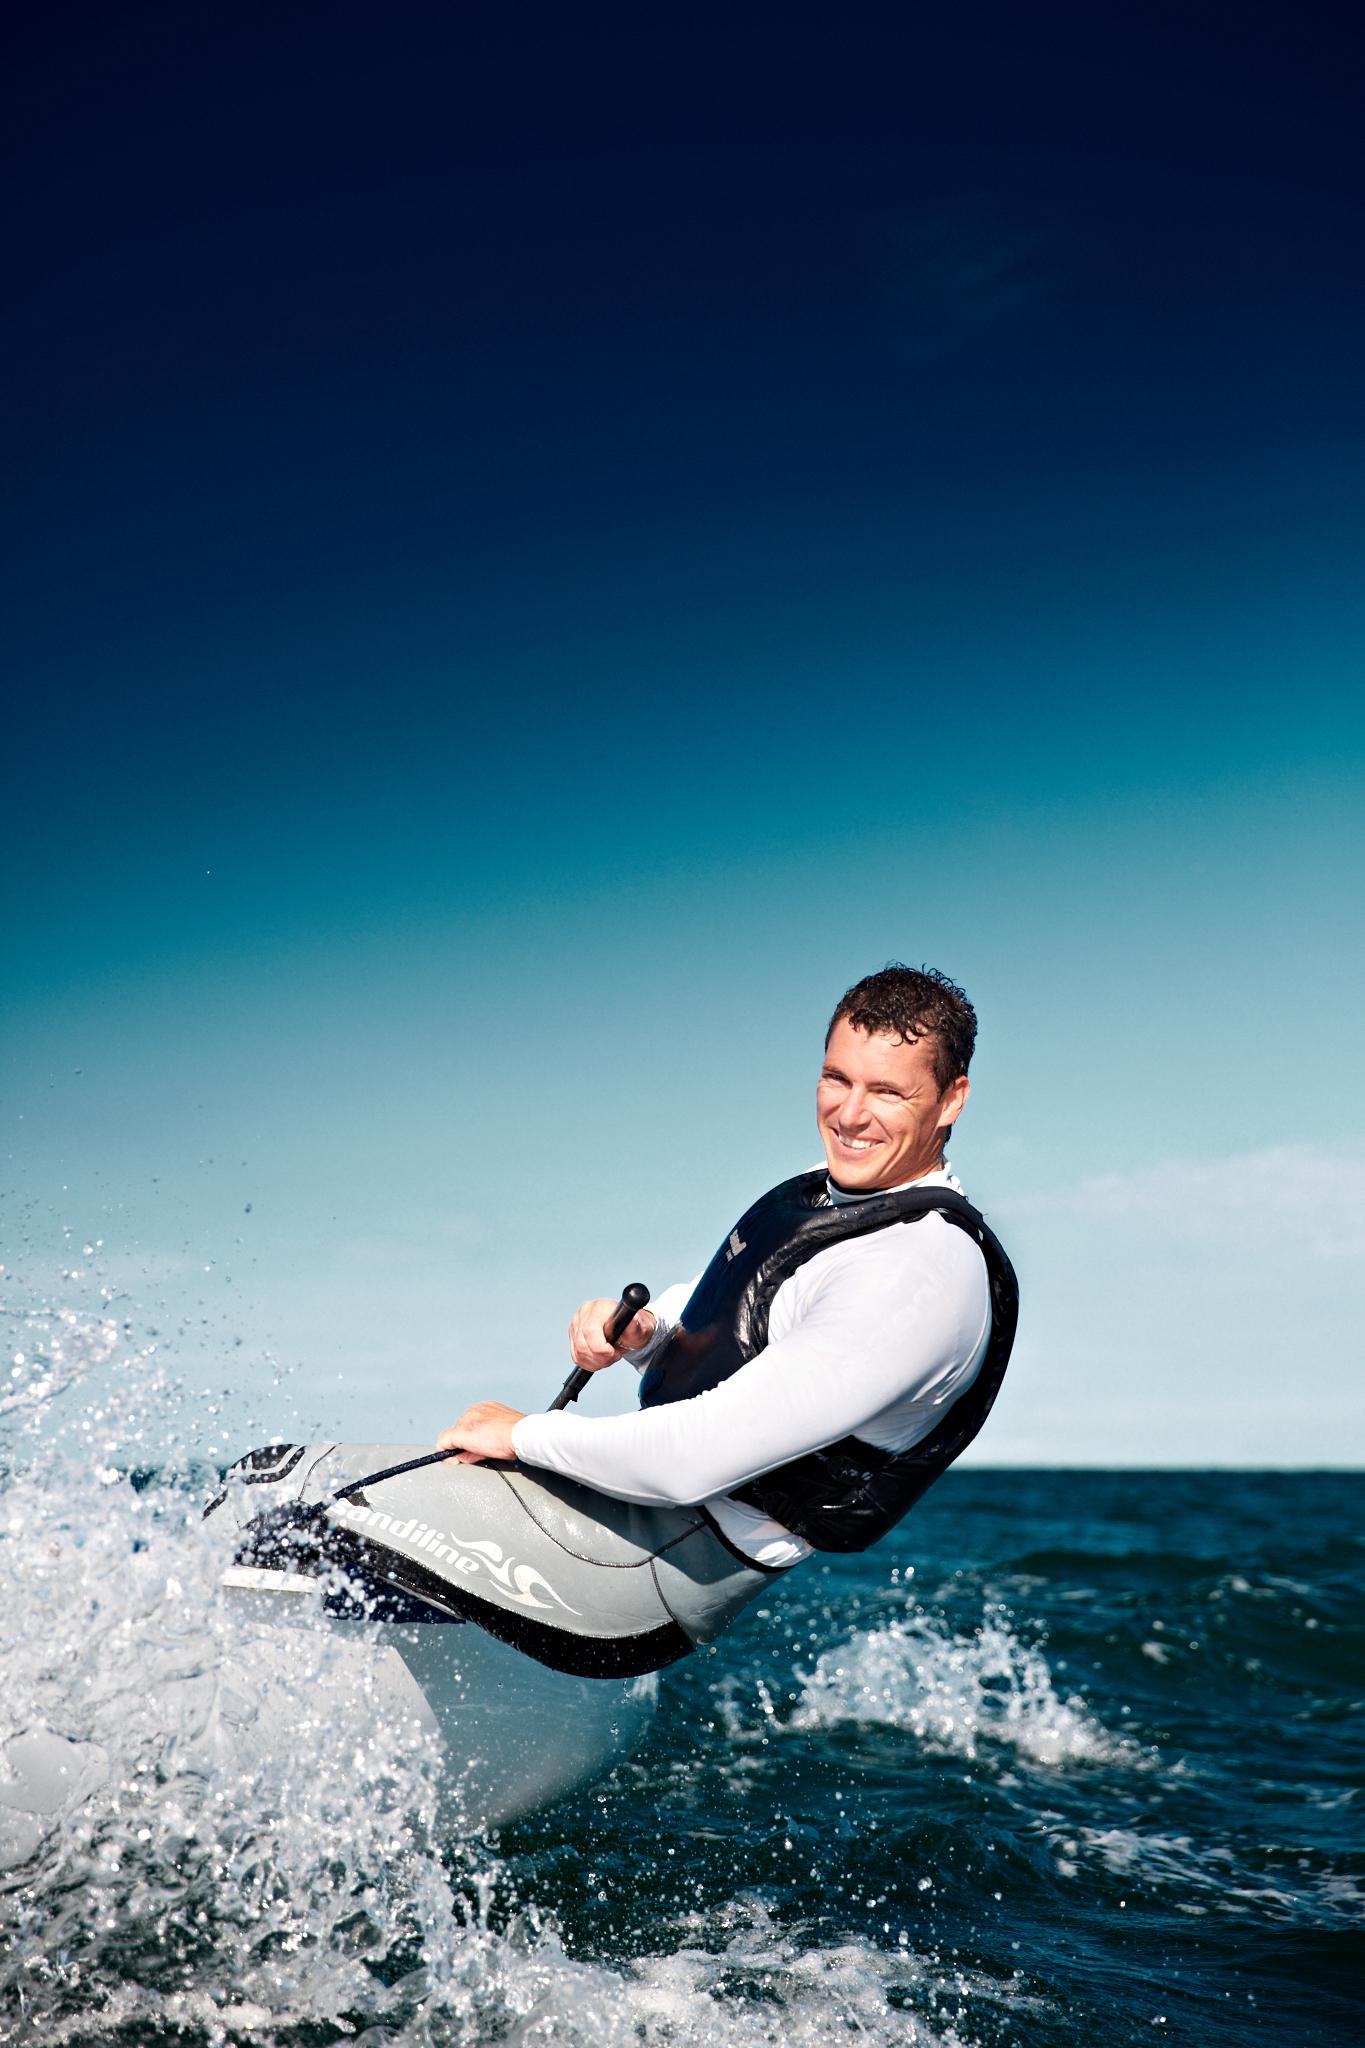 Slovenia Vasilij Zbogar Win Silver Sailing Men's Finn Rio 2016 Olympic Games